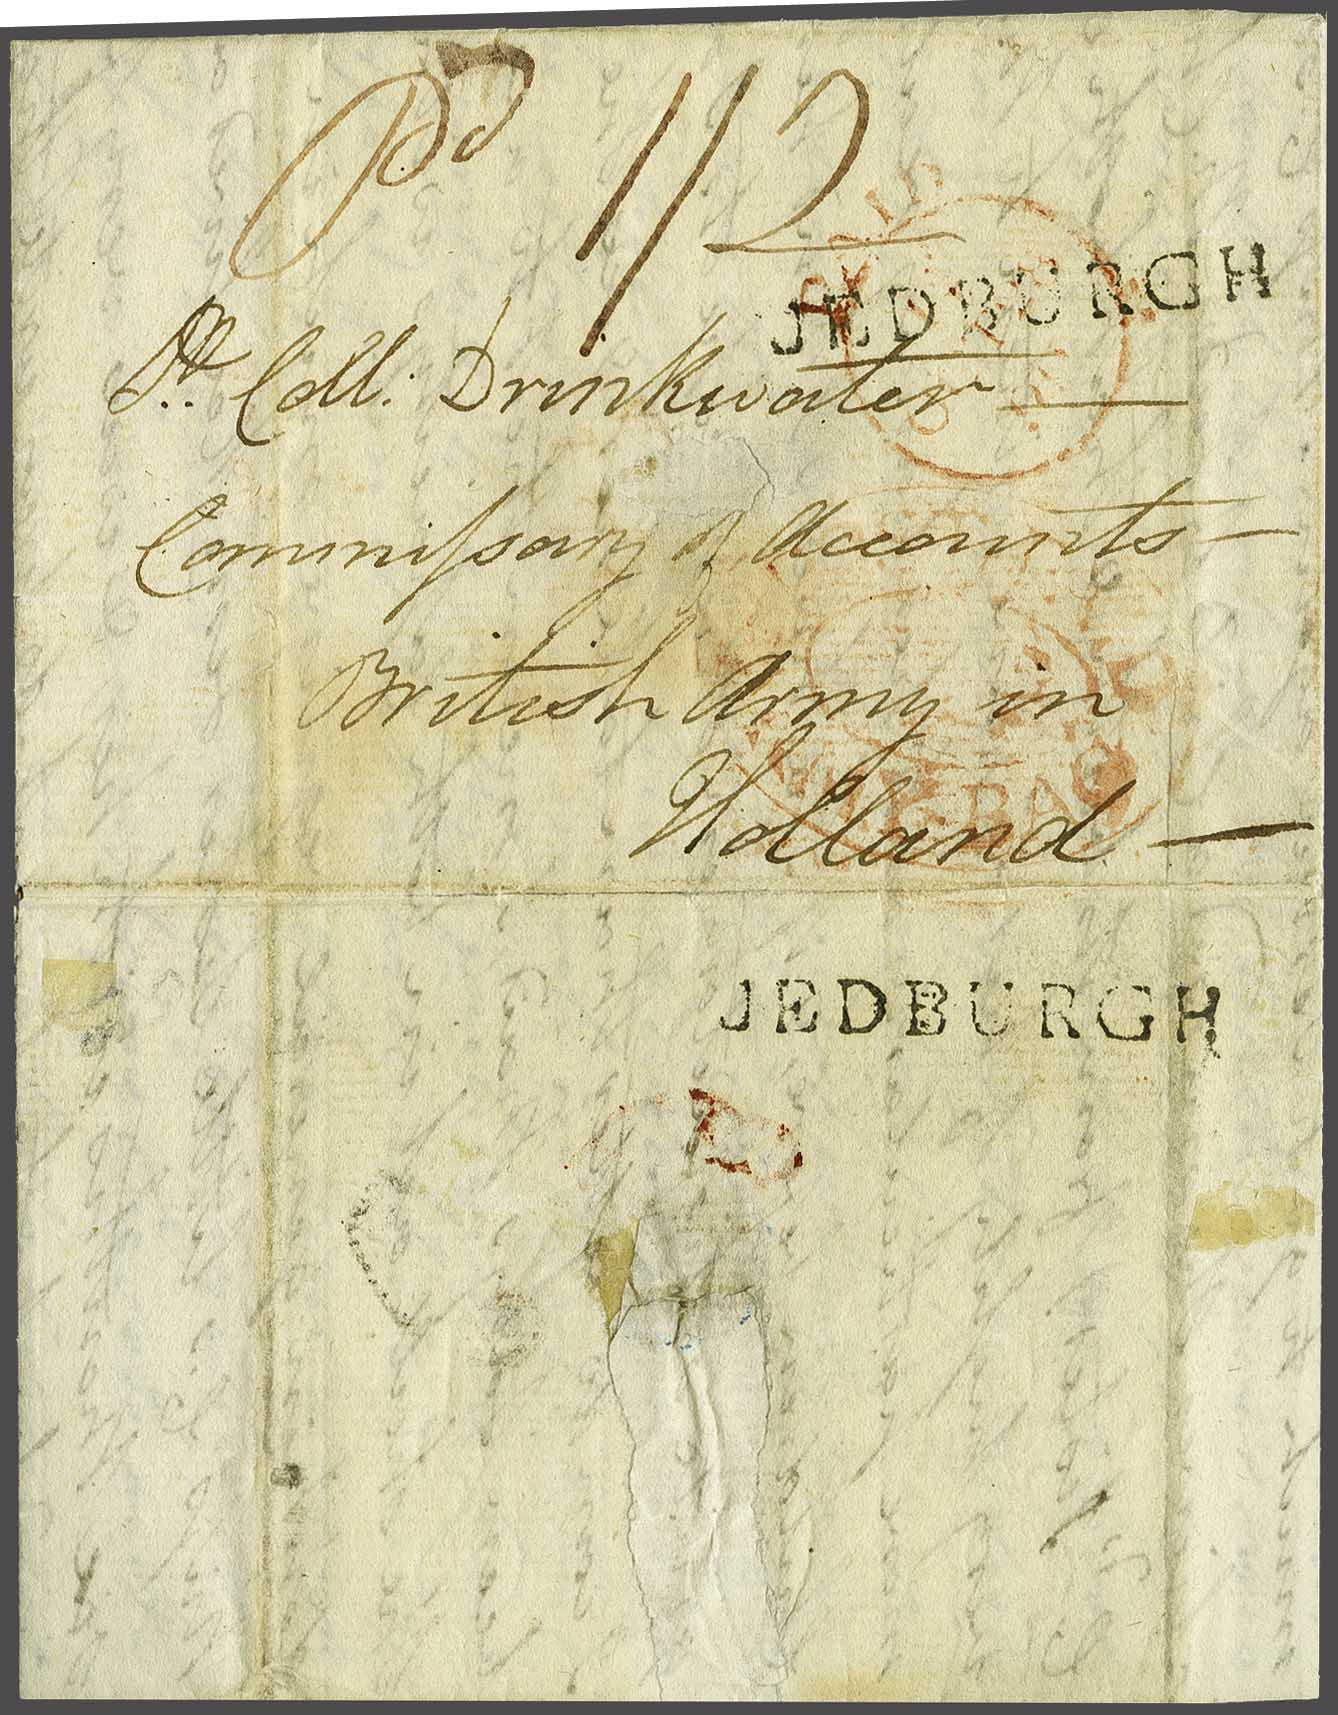 Lot 170 - Netherlands and Former Territories Netherlands -  Corinphila veilingen Auction 233: General sale